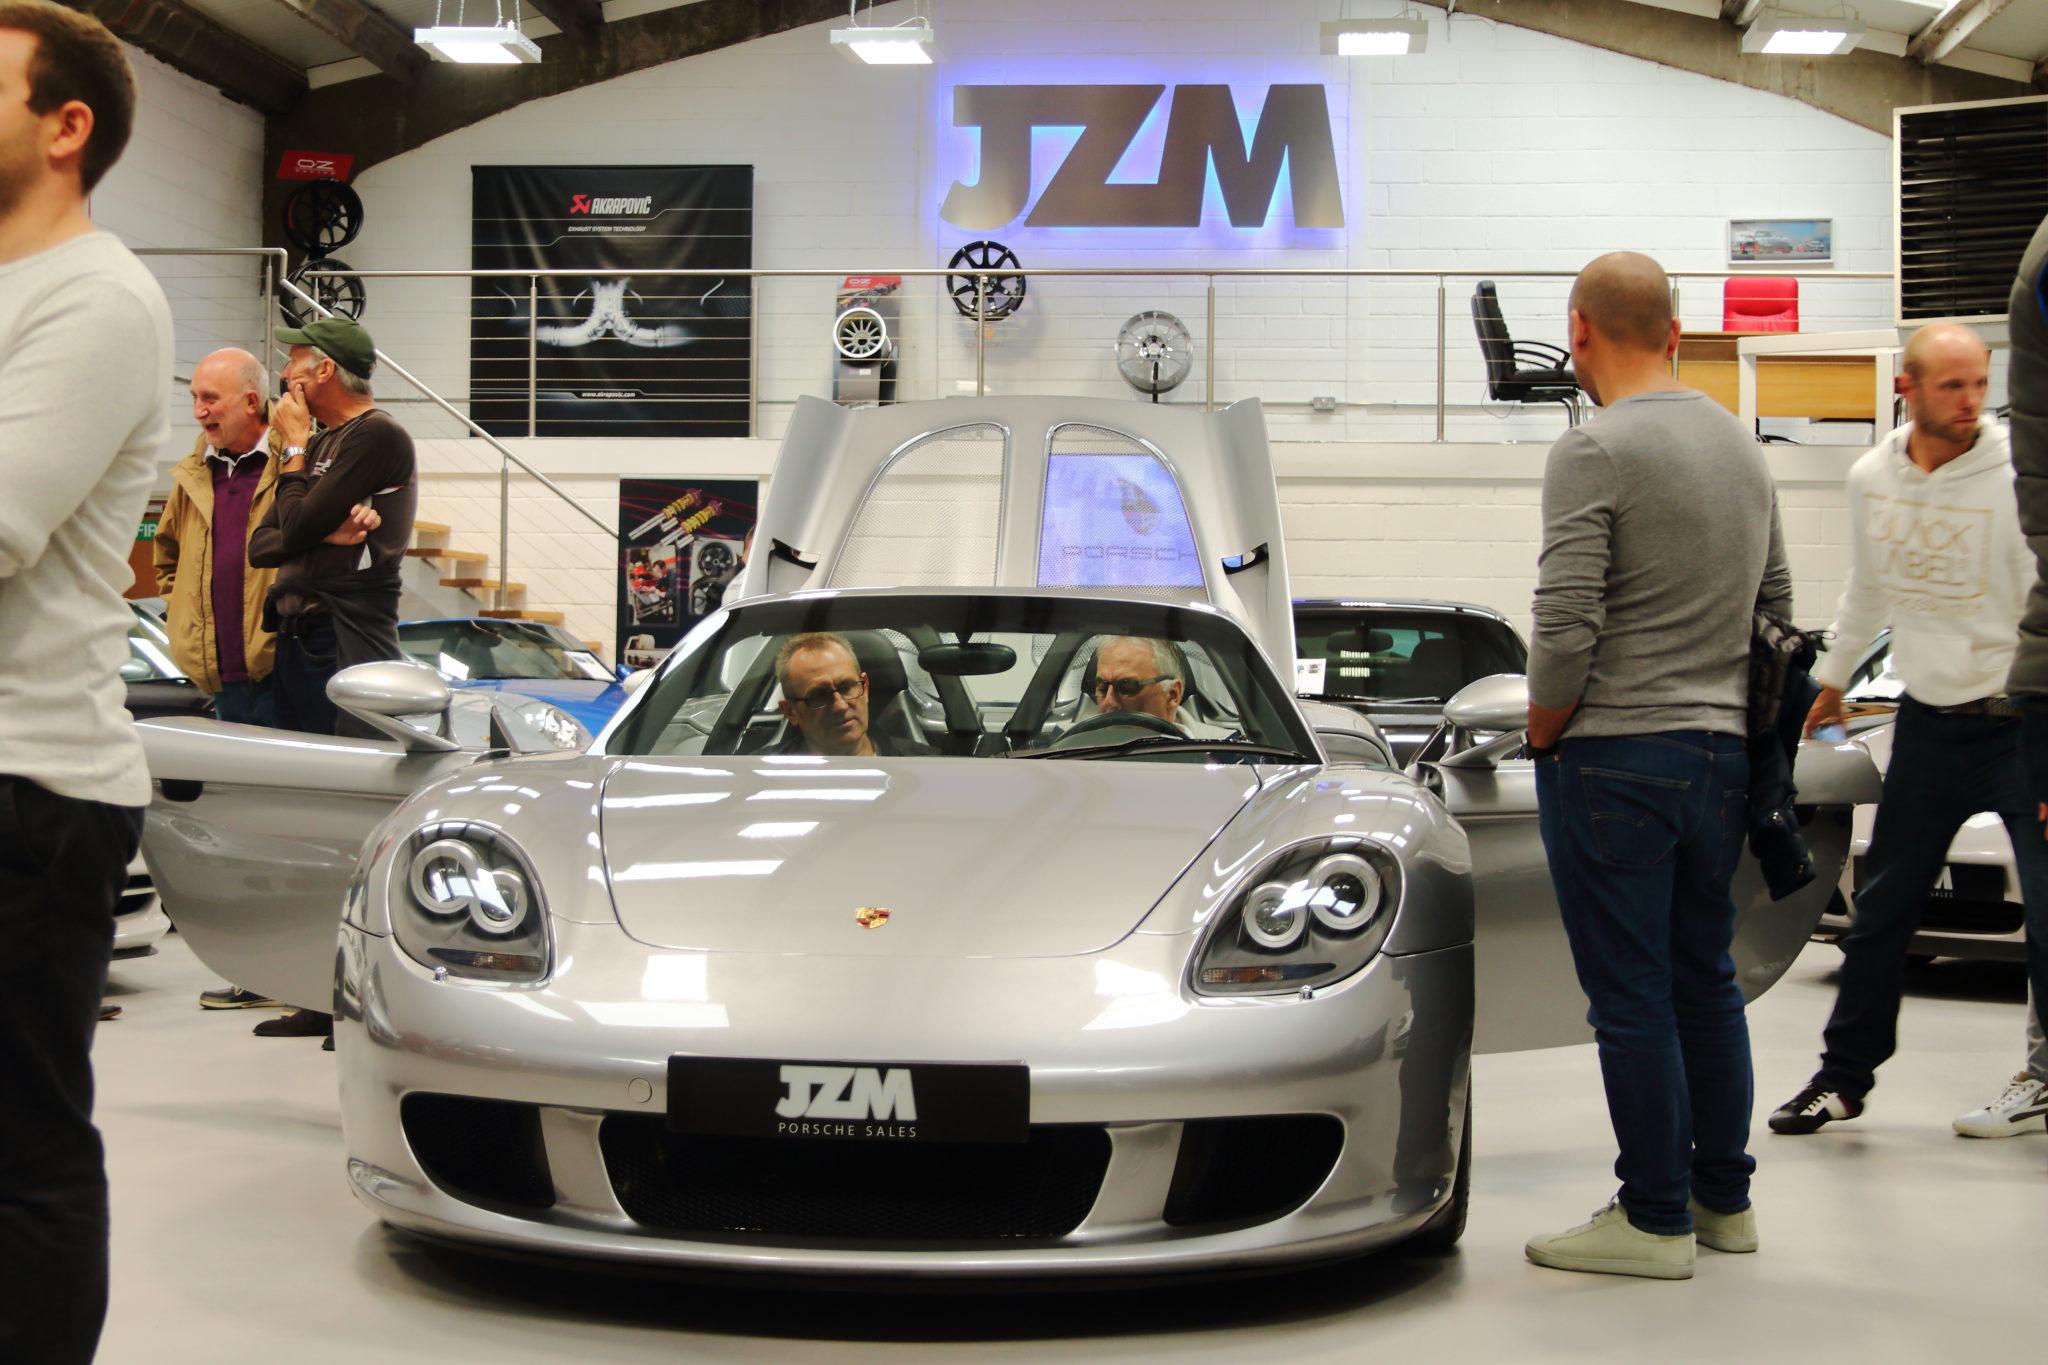 Coffee Morning at JZM Porsche